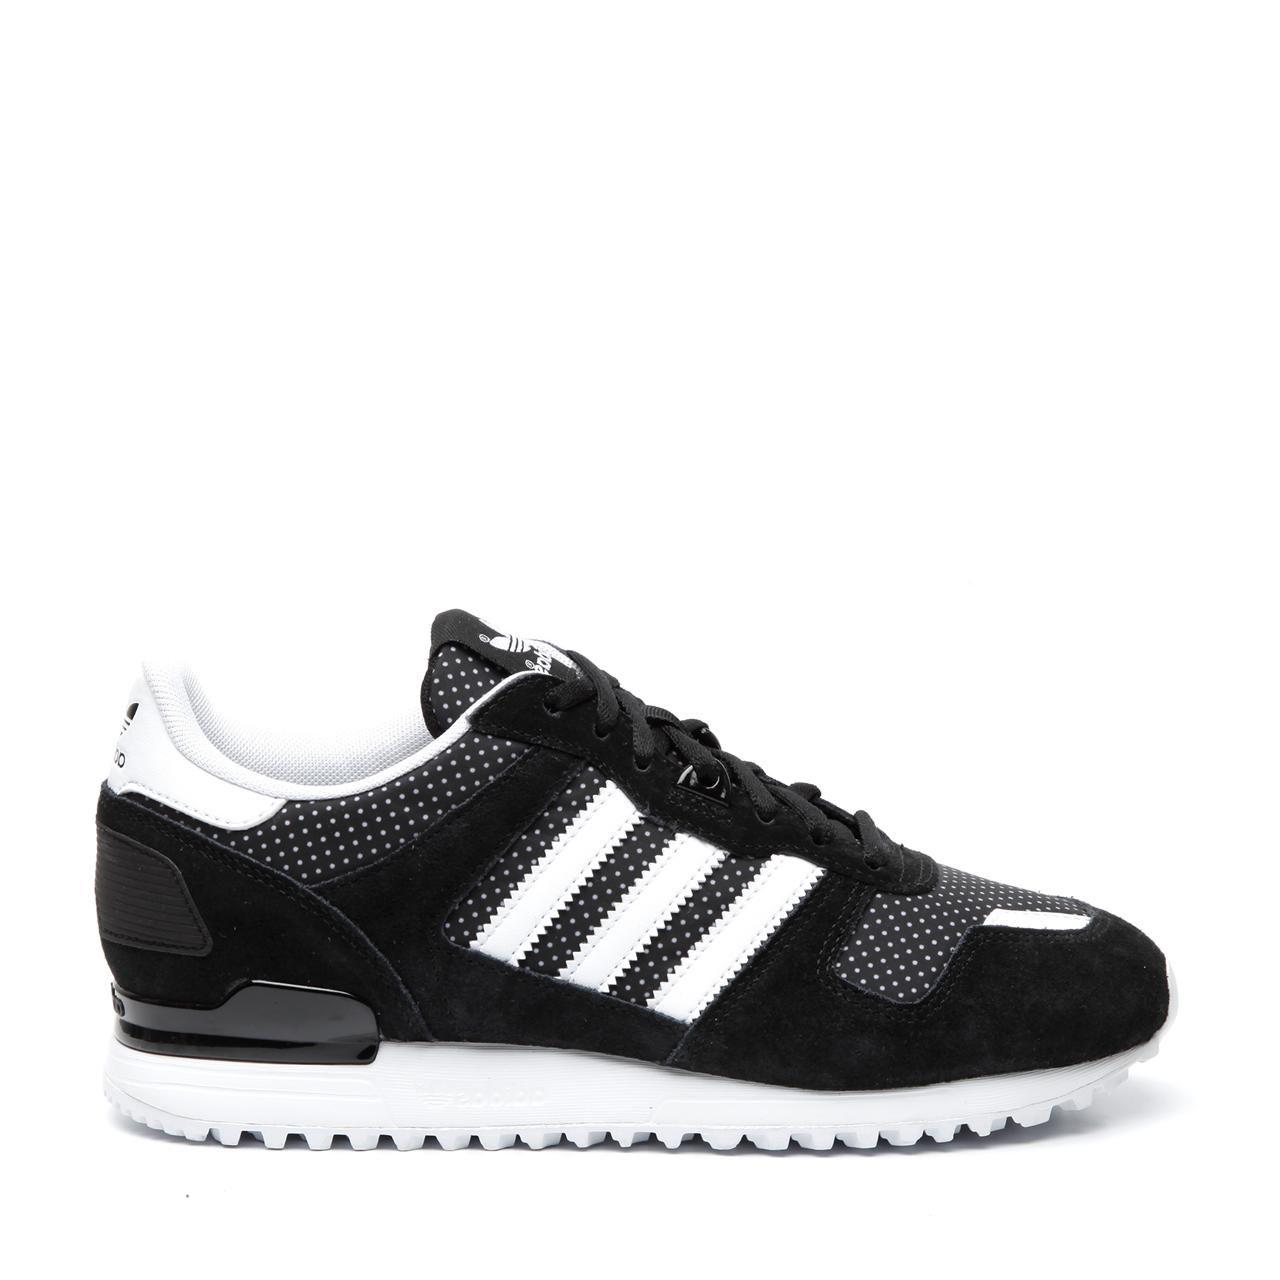 9a8e8ad2eba1 Adidas - Zx 700 W